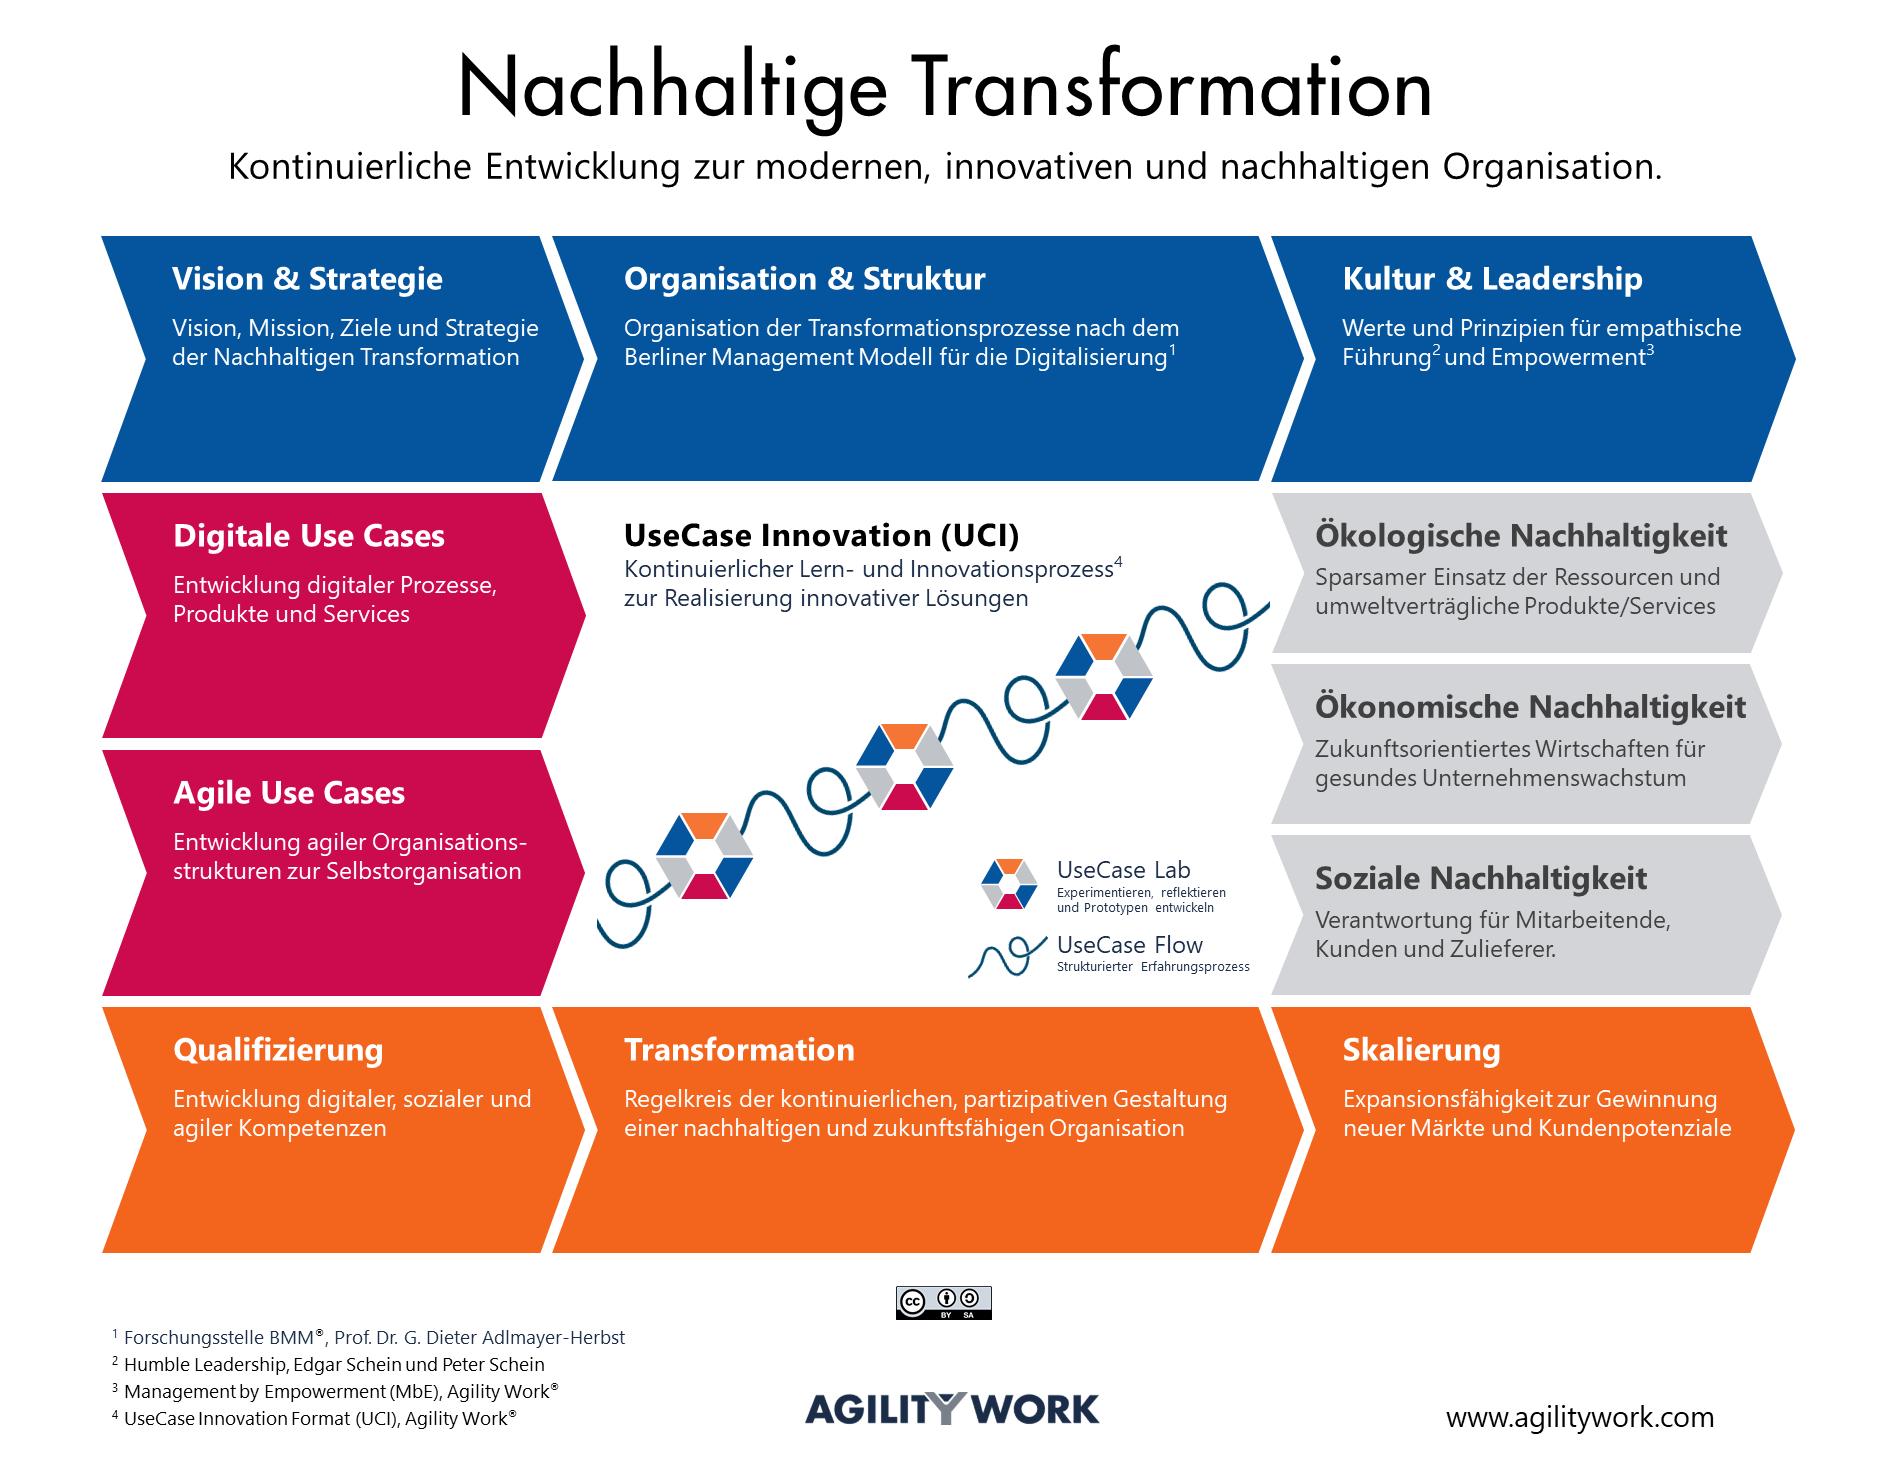 Nachhaltige Transformation - CC BY-SA